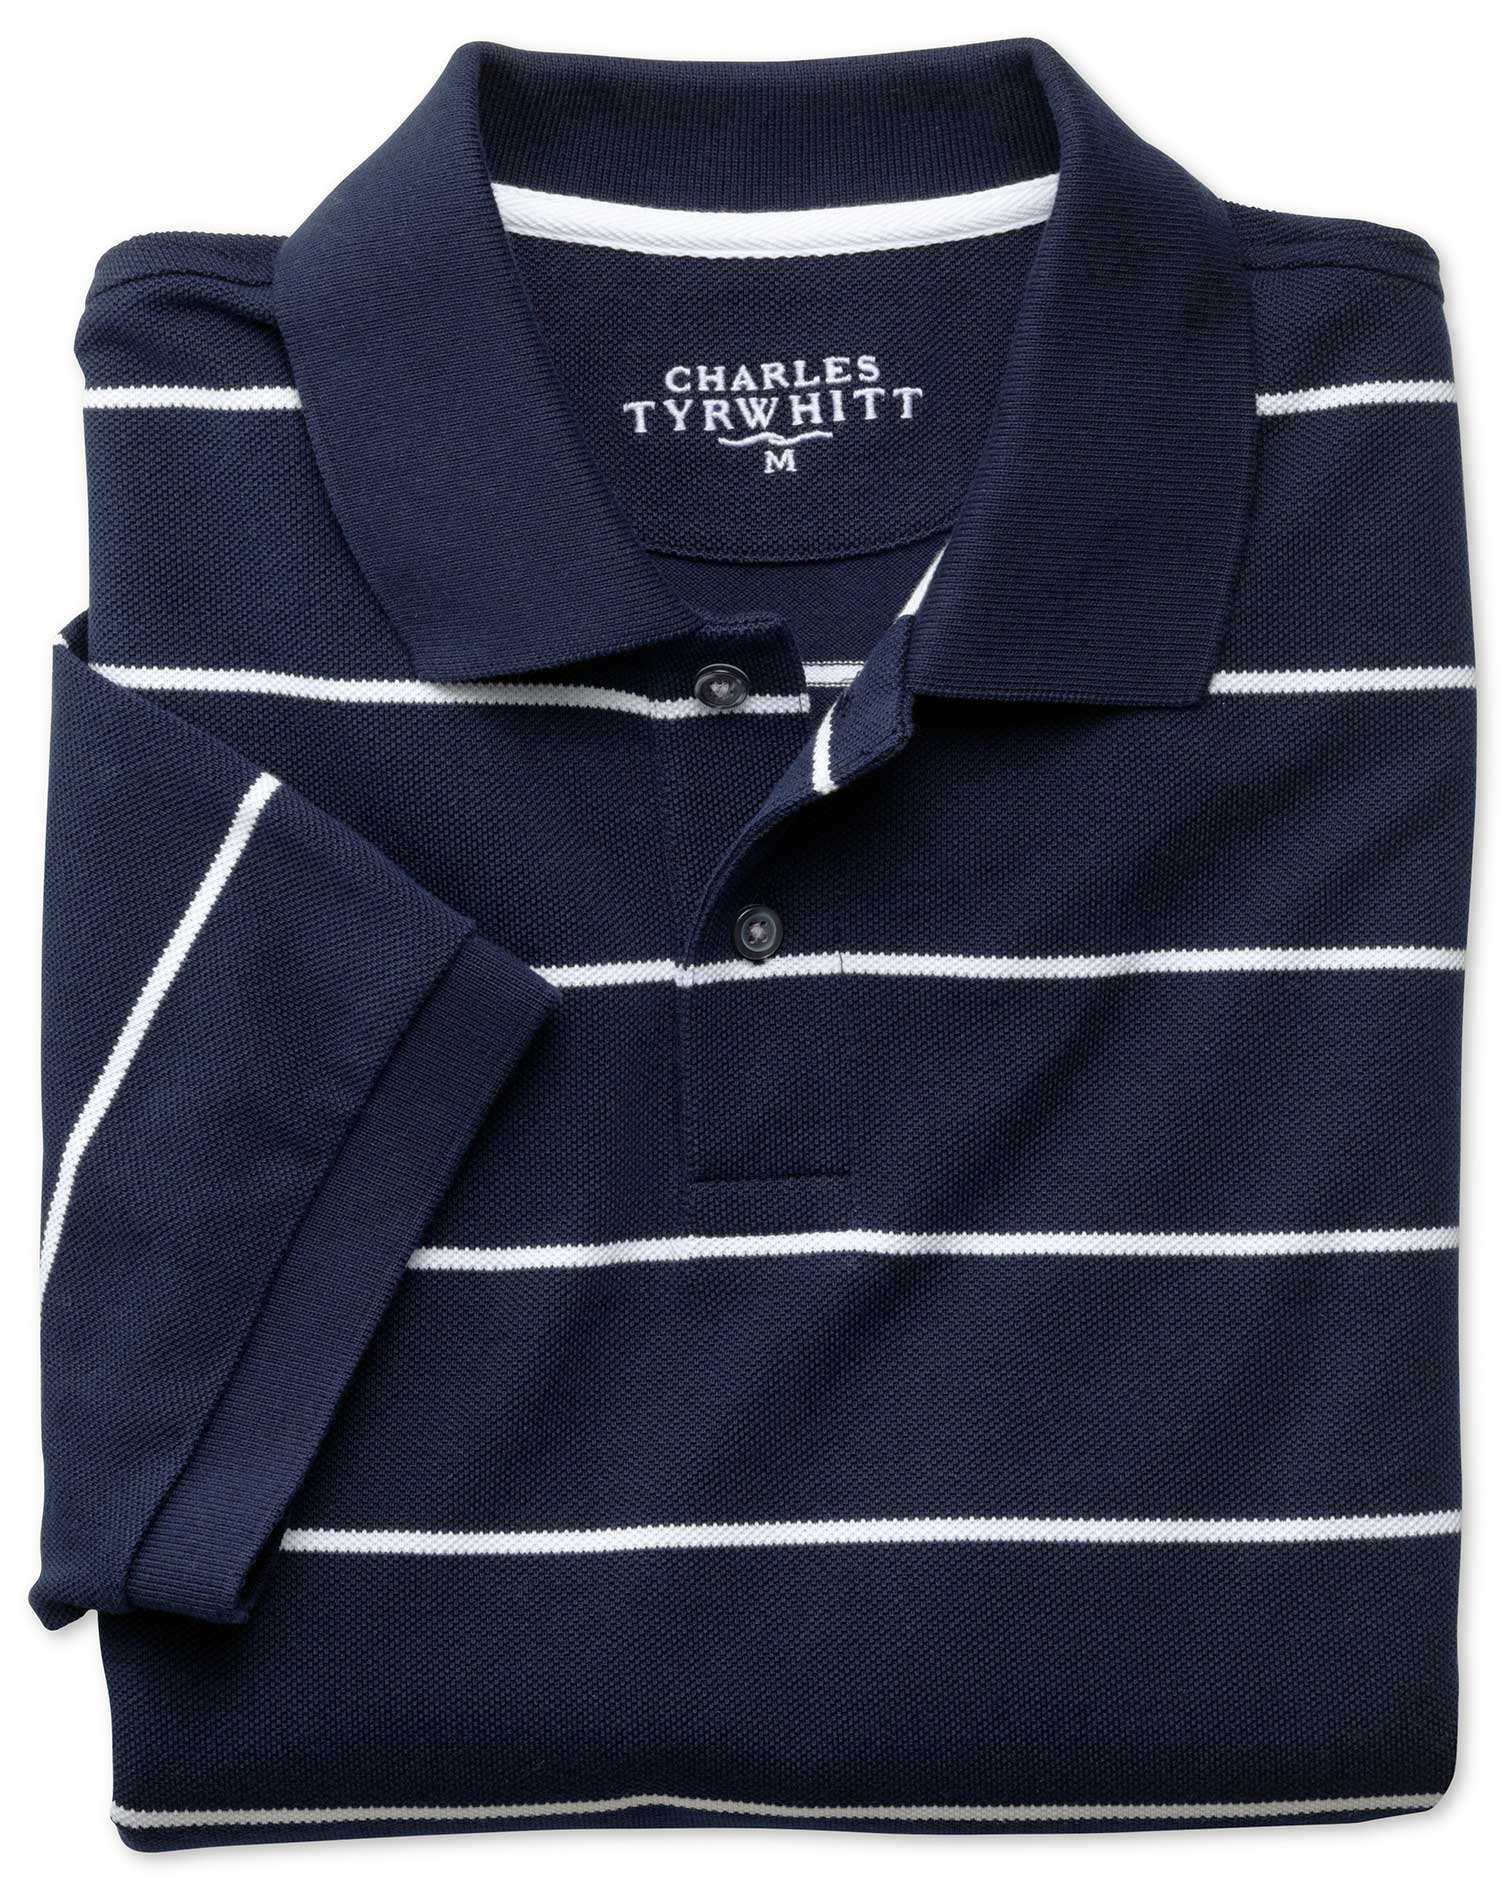 Navy and White Stripe Pique Cotton Polo Size XL by Charles Tyrwhitt